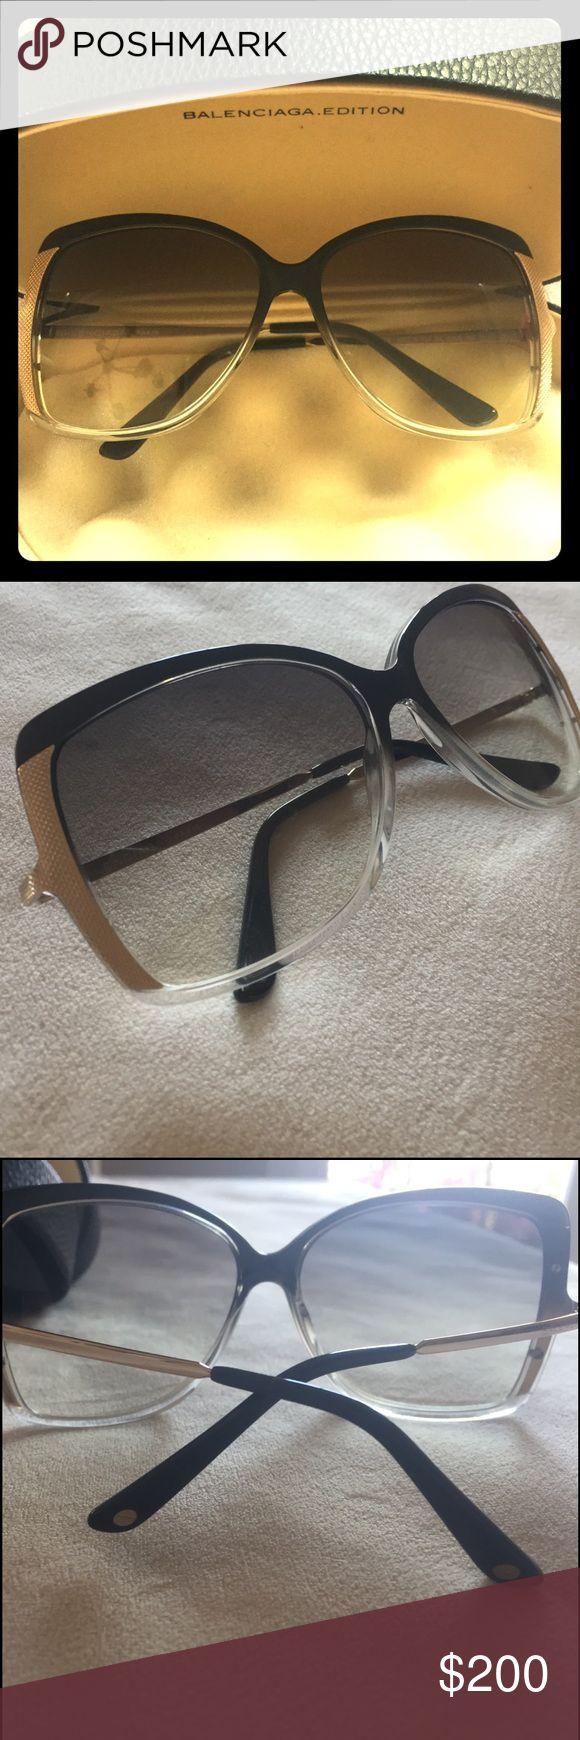 Selling this Balenciaga Edition Sunglasses on Poshmark! My username is: kesh0507. #shopmycloset #poshmark #fashion #shopping #style #forsale #Balenciaga #Accessories